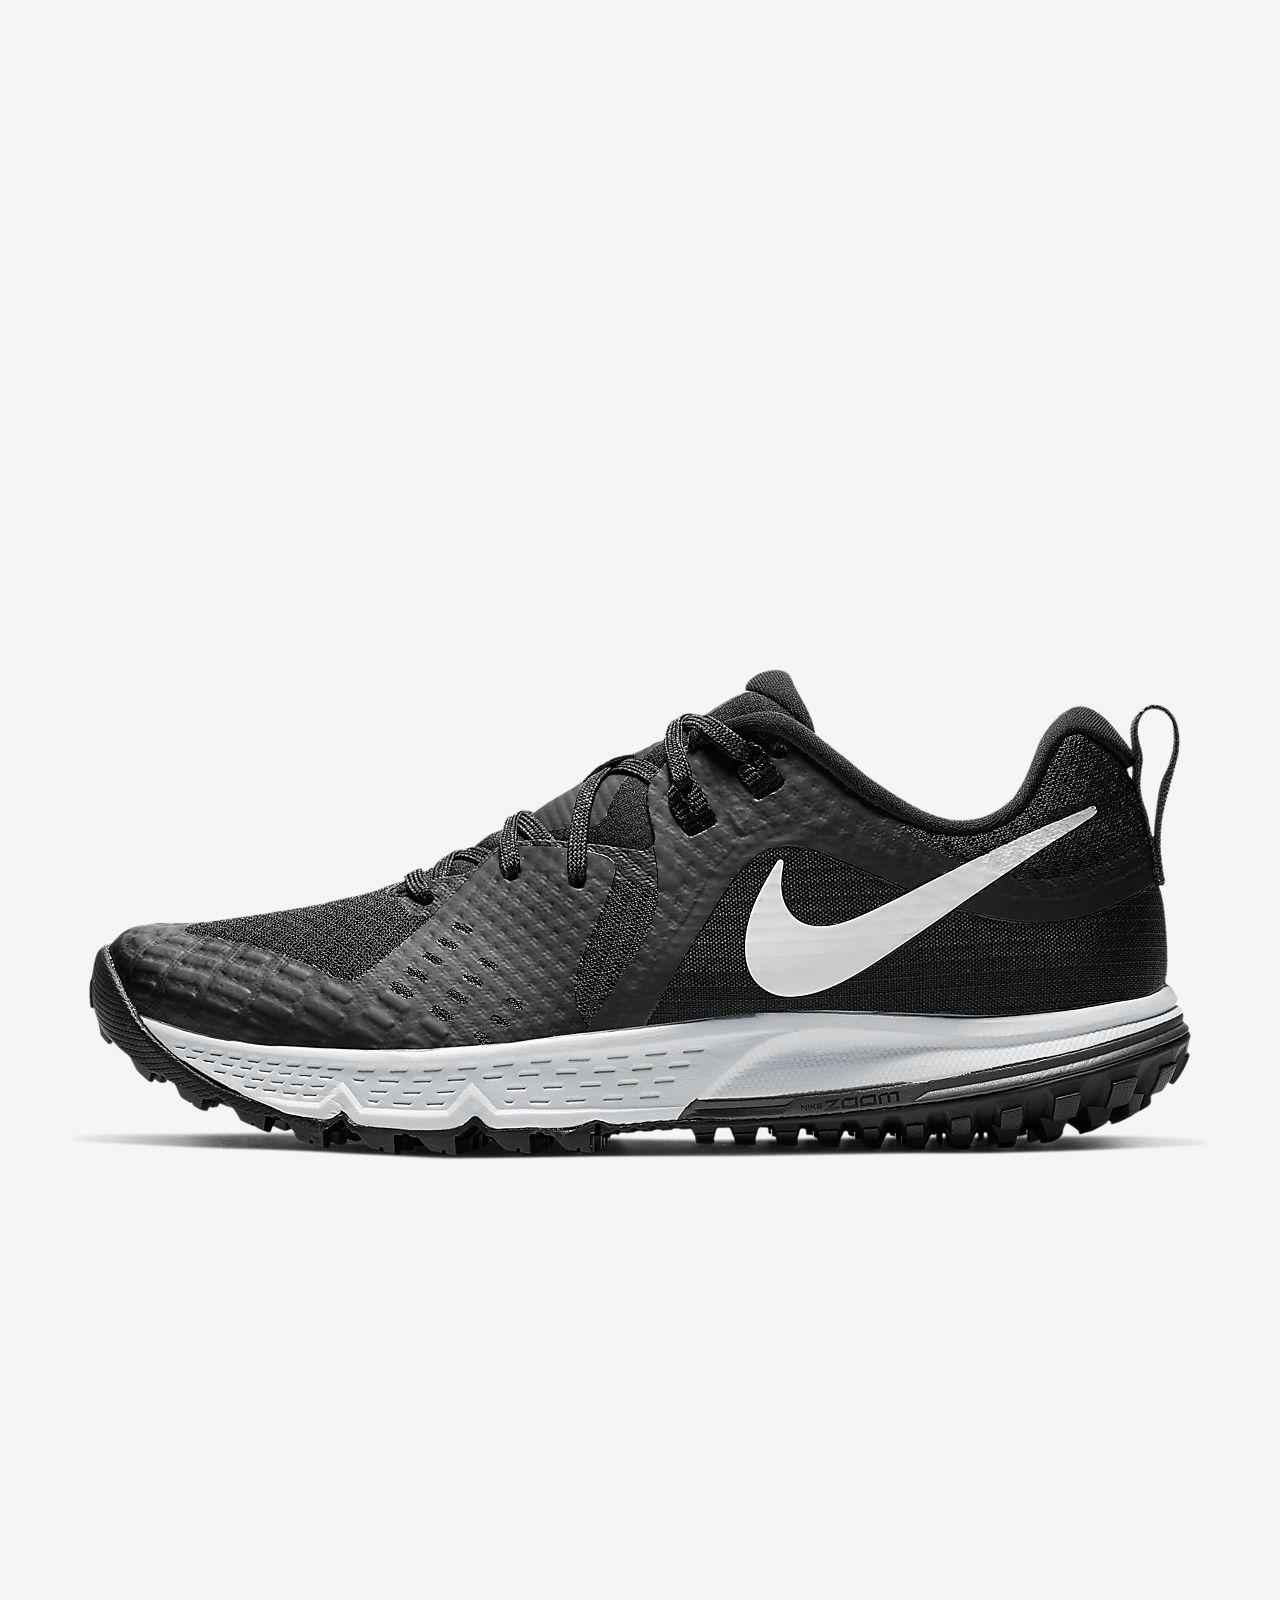 Chaussure de running Nike Air Zoom Wildhorse 5 pour Femme